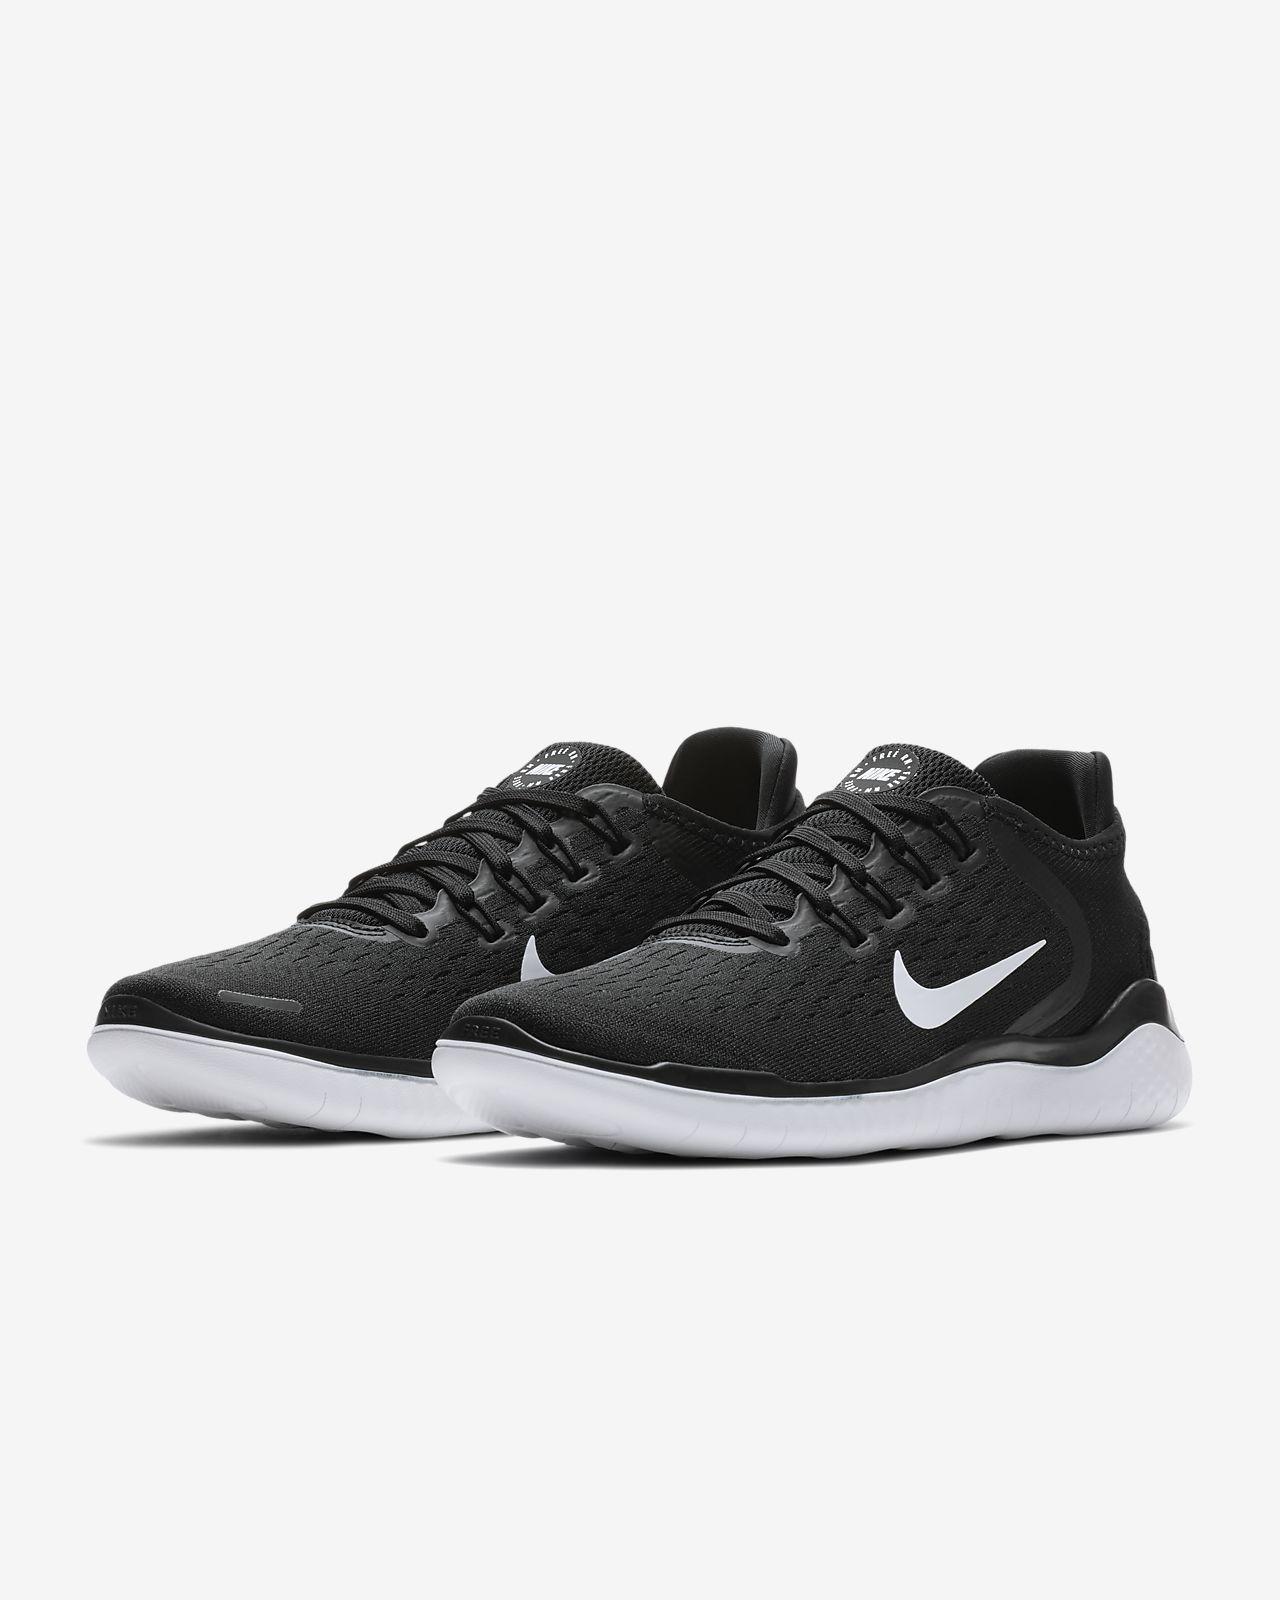 Nike Free RN 2018 Women's Running Shoe